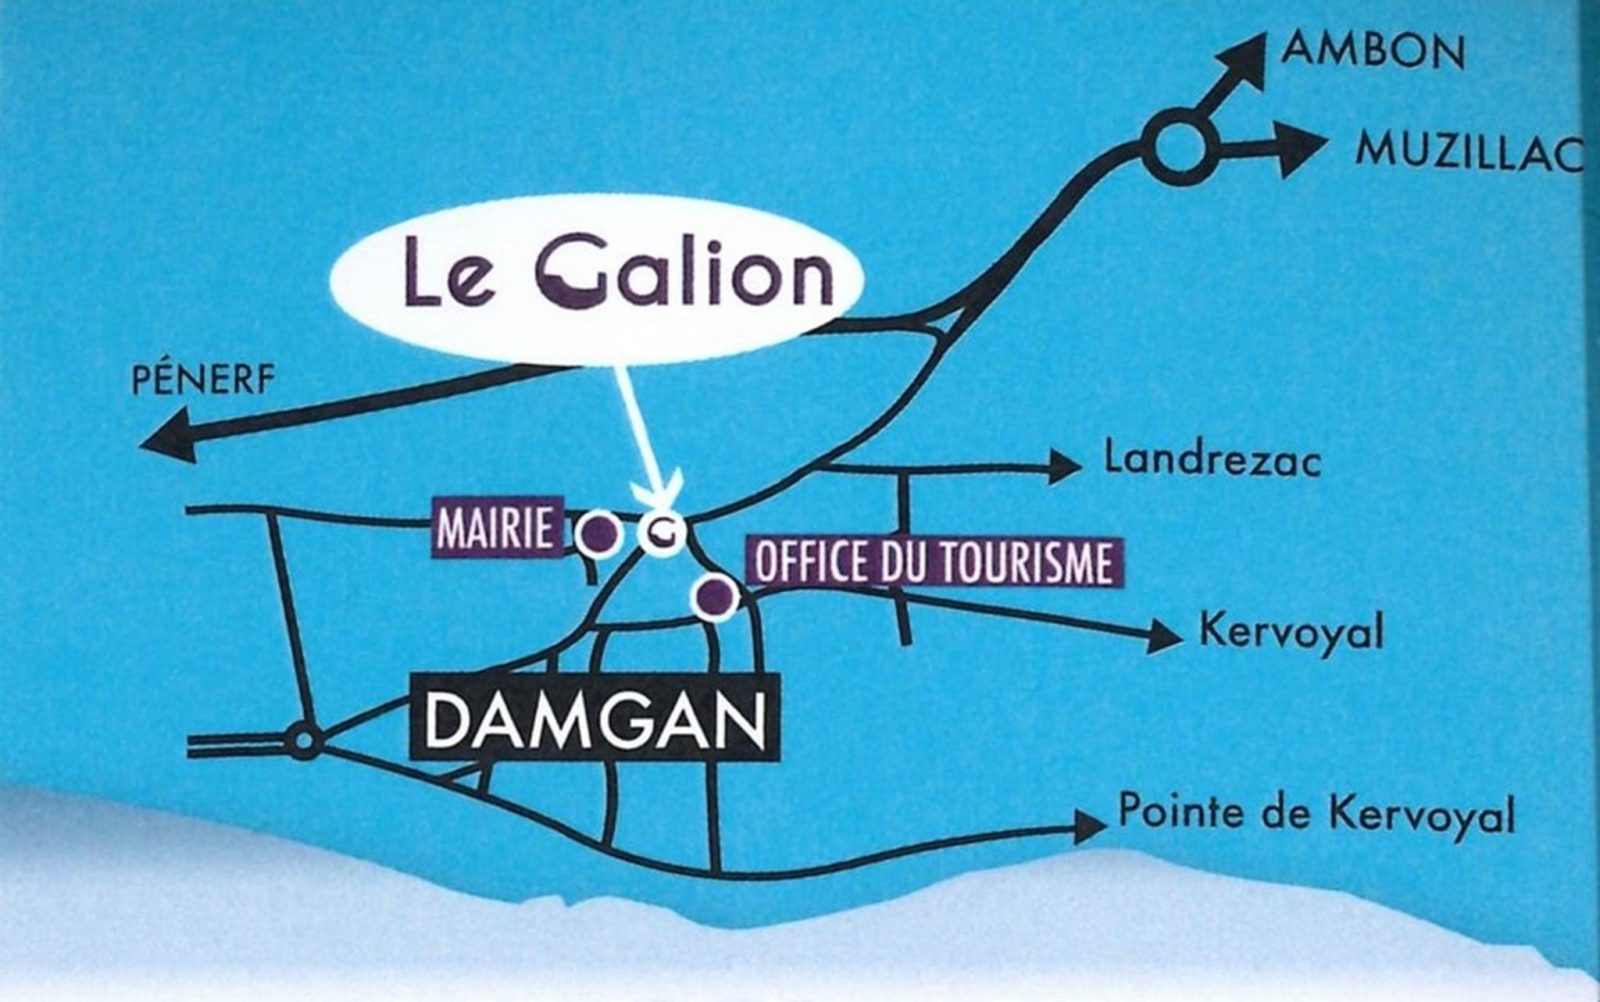 Galion Damgan Morbihan